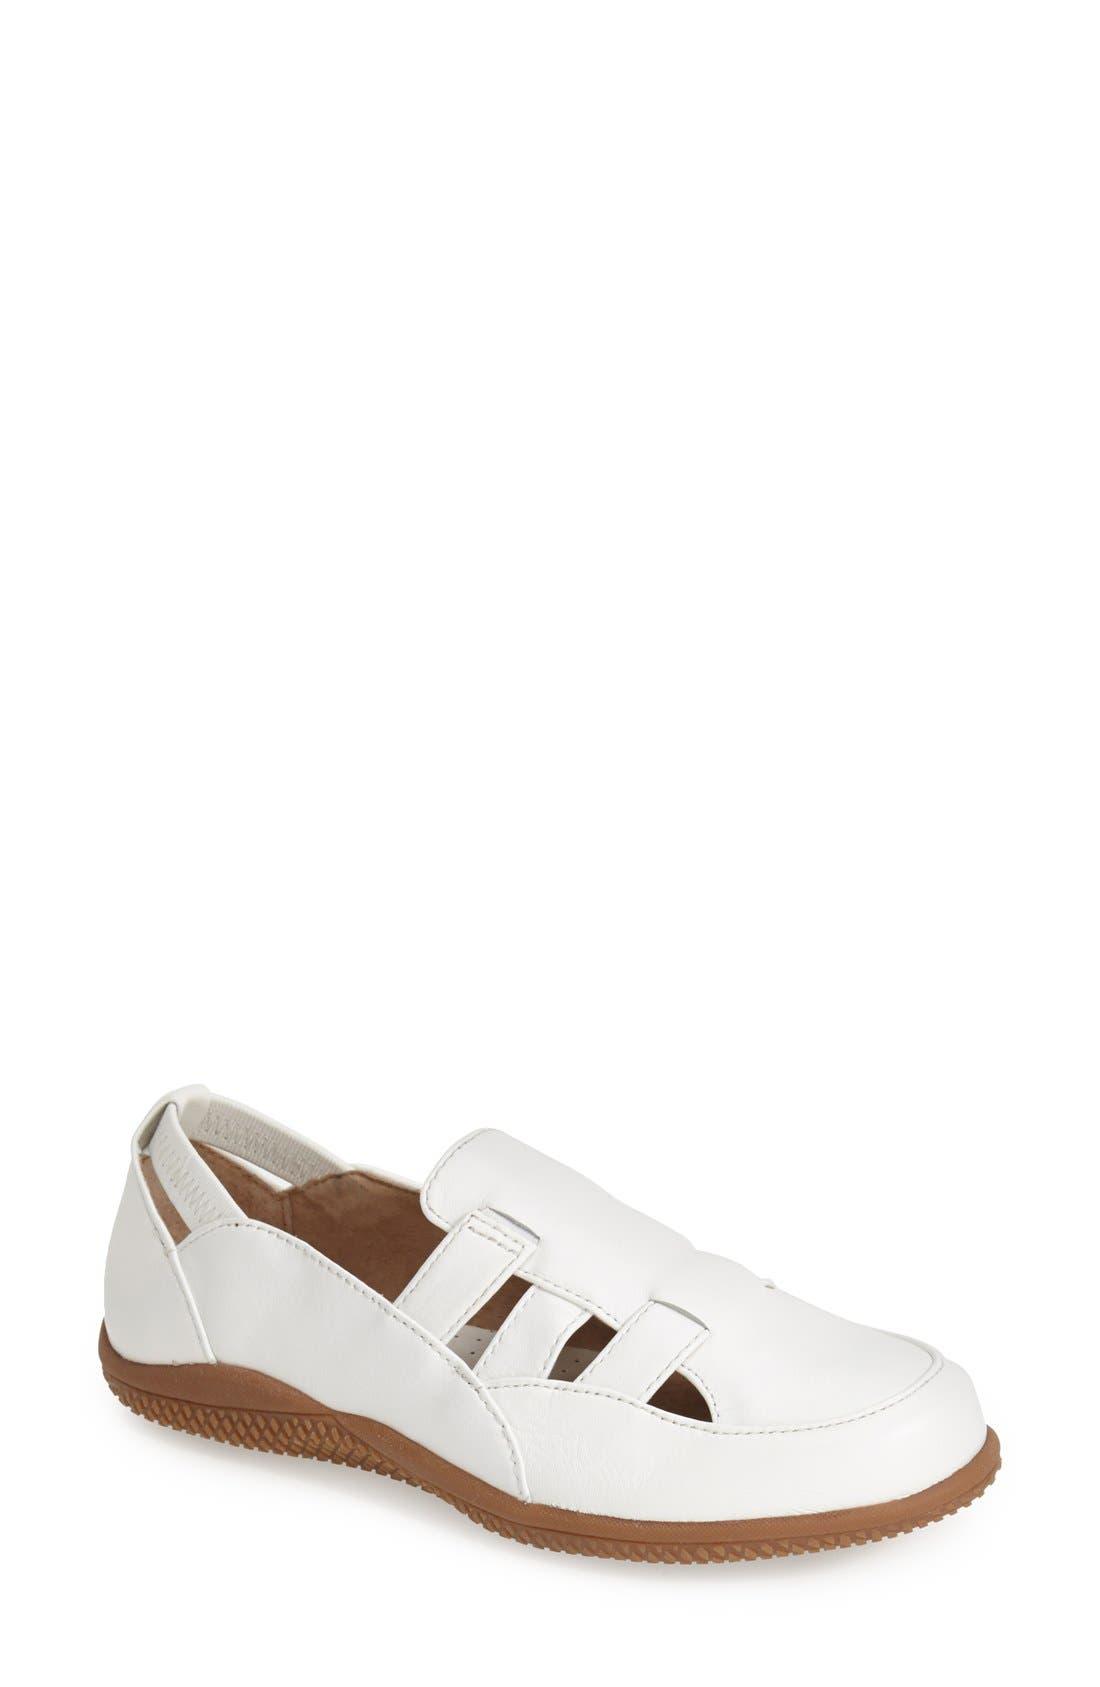 SoftWalk® 'Hampton' Leather Strap Loafer (Women)